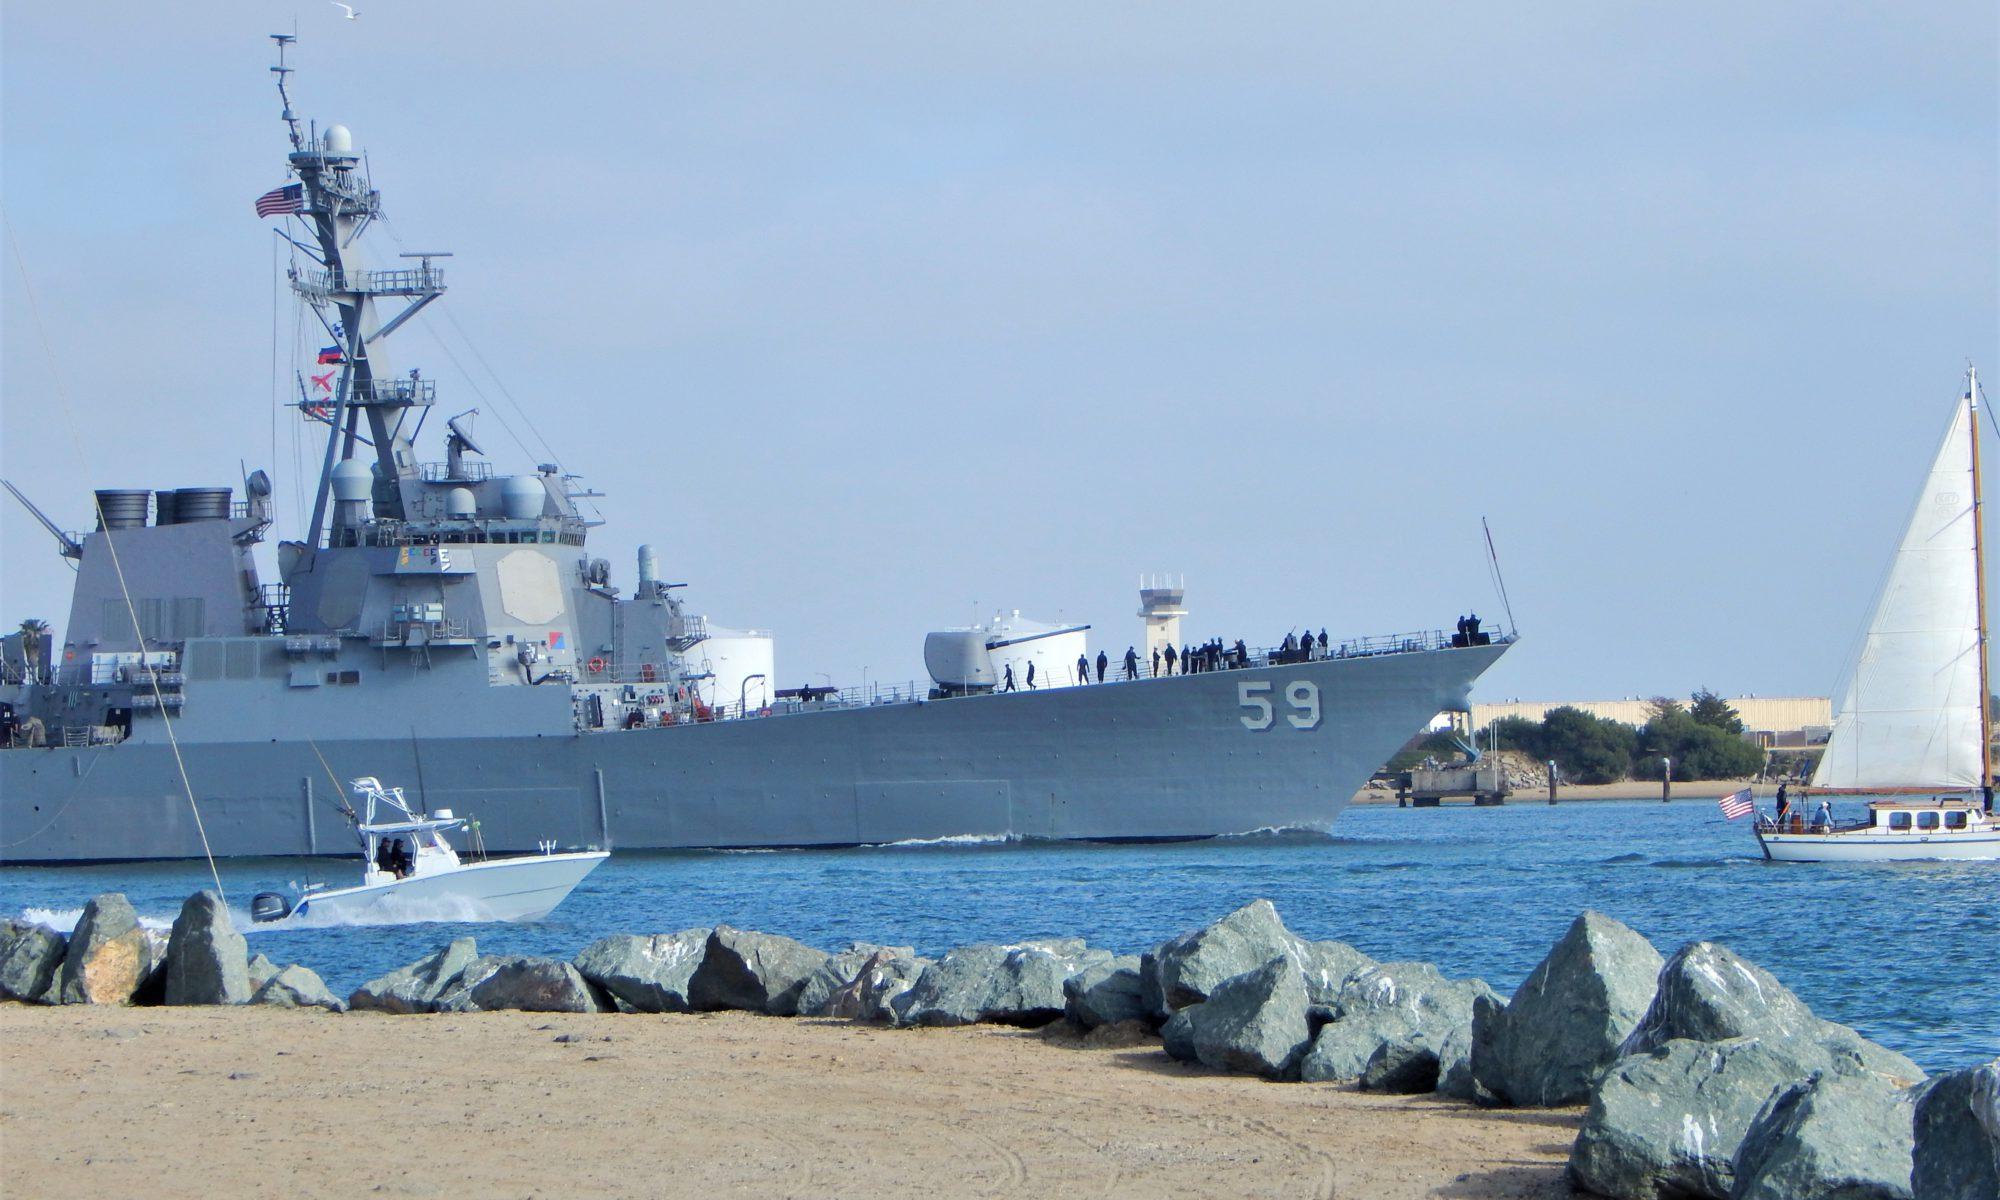 San Diego Bay Naval Ship Leaving